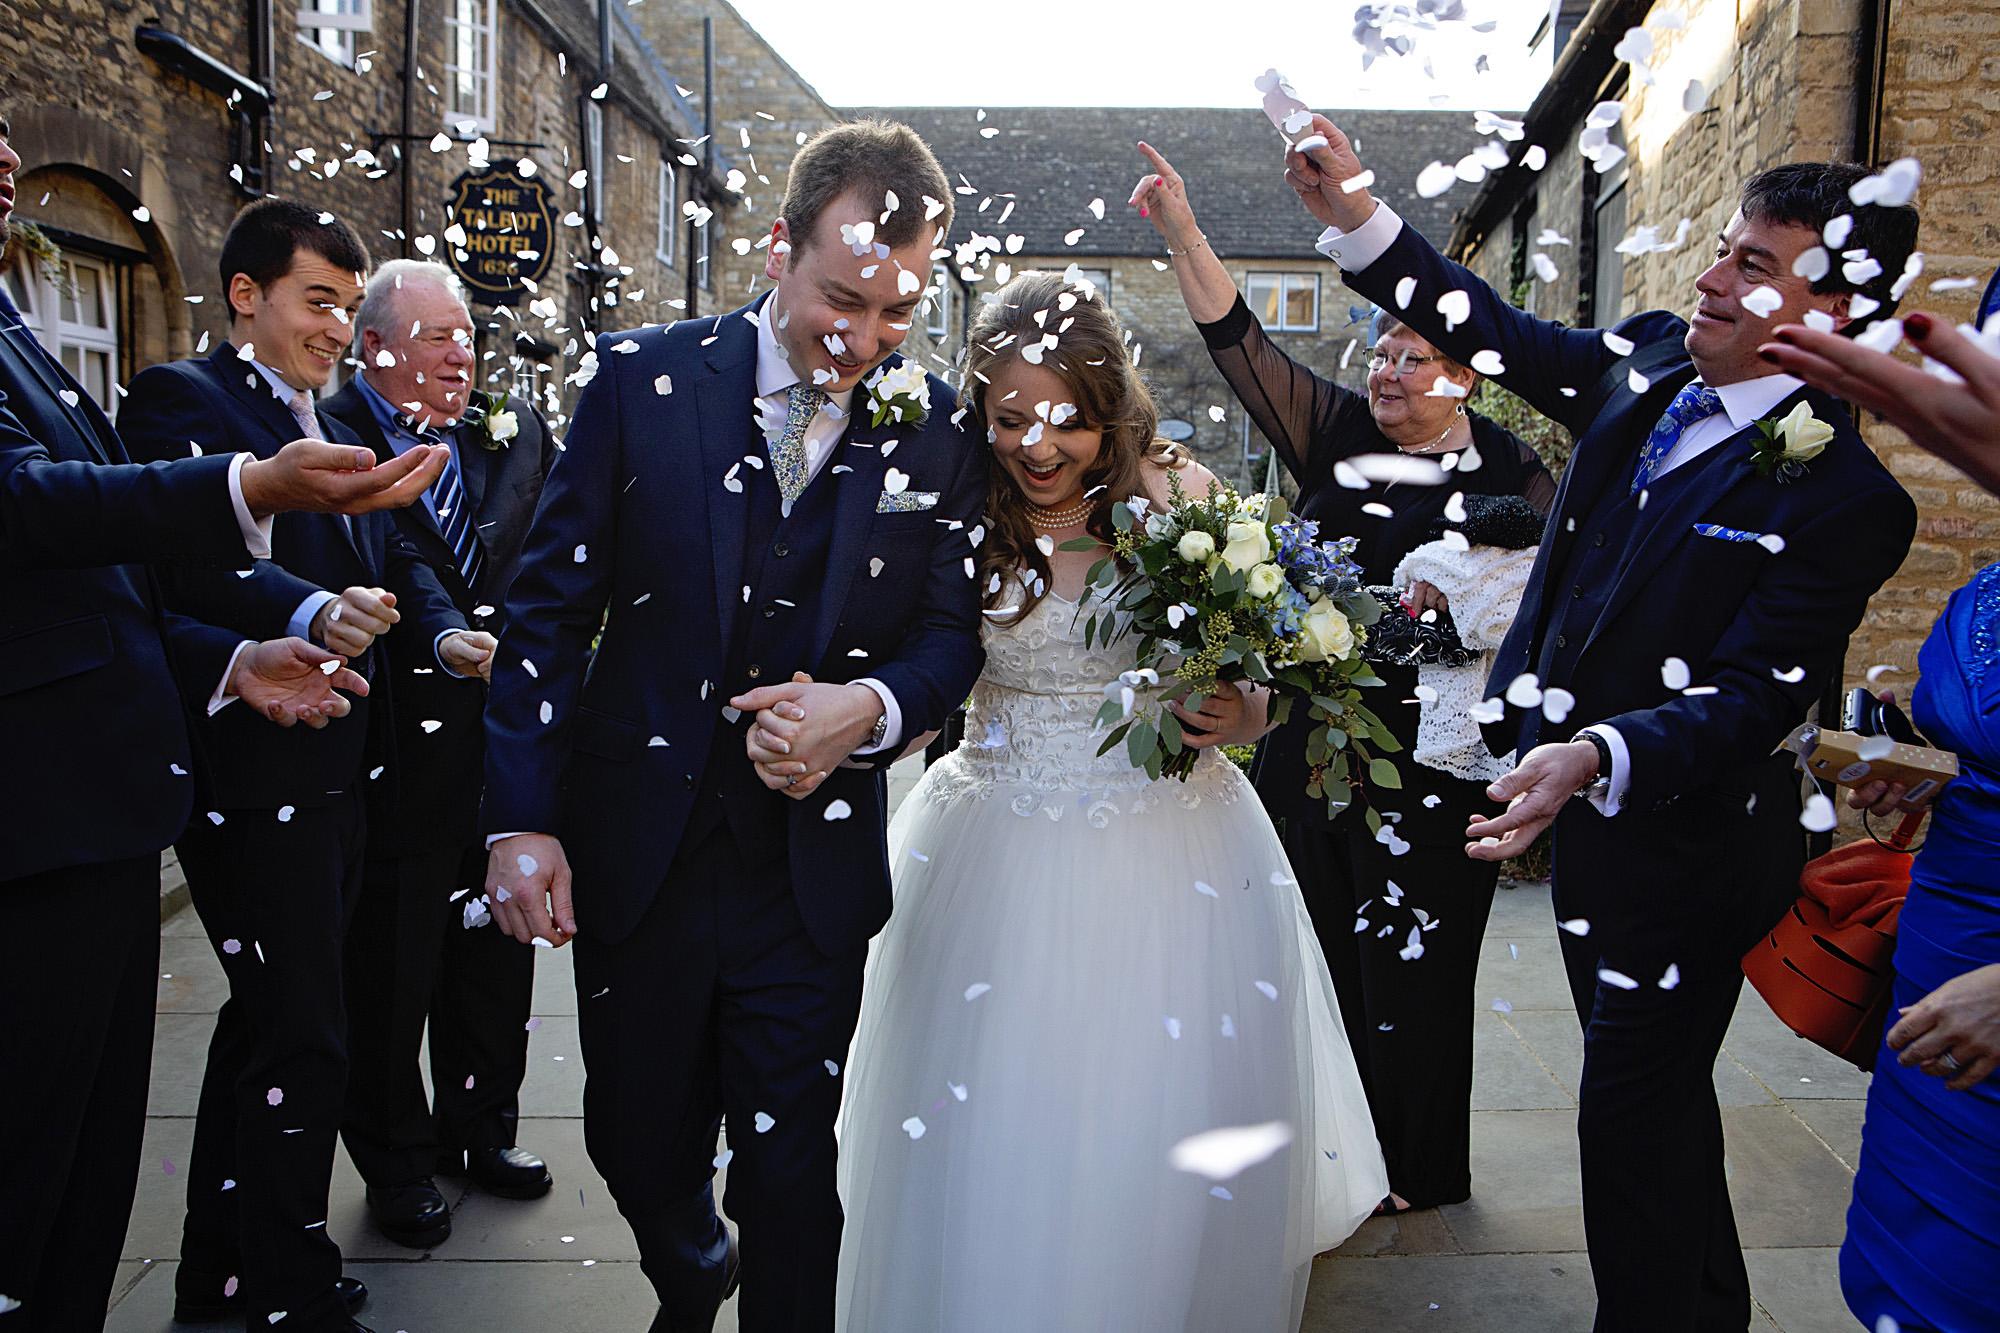 wedding-photos-talbot-hotel-oundle (30).jpg